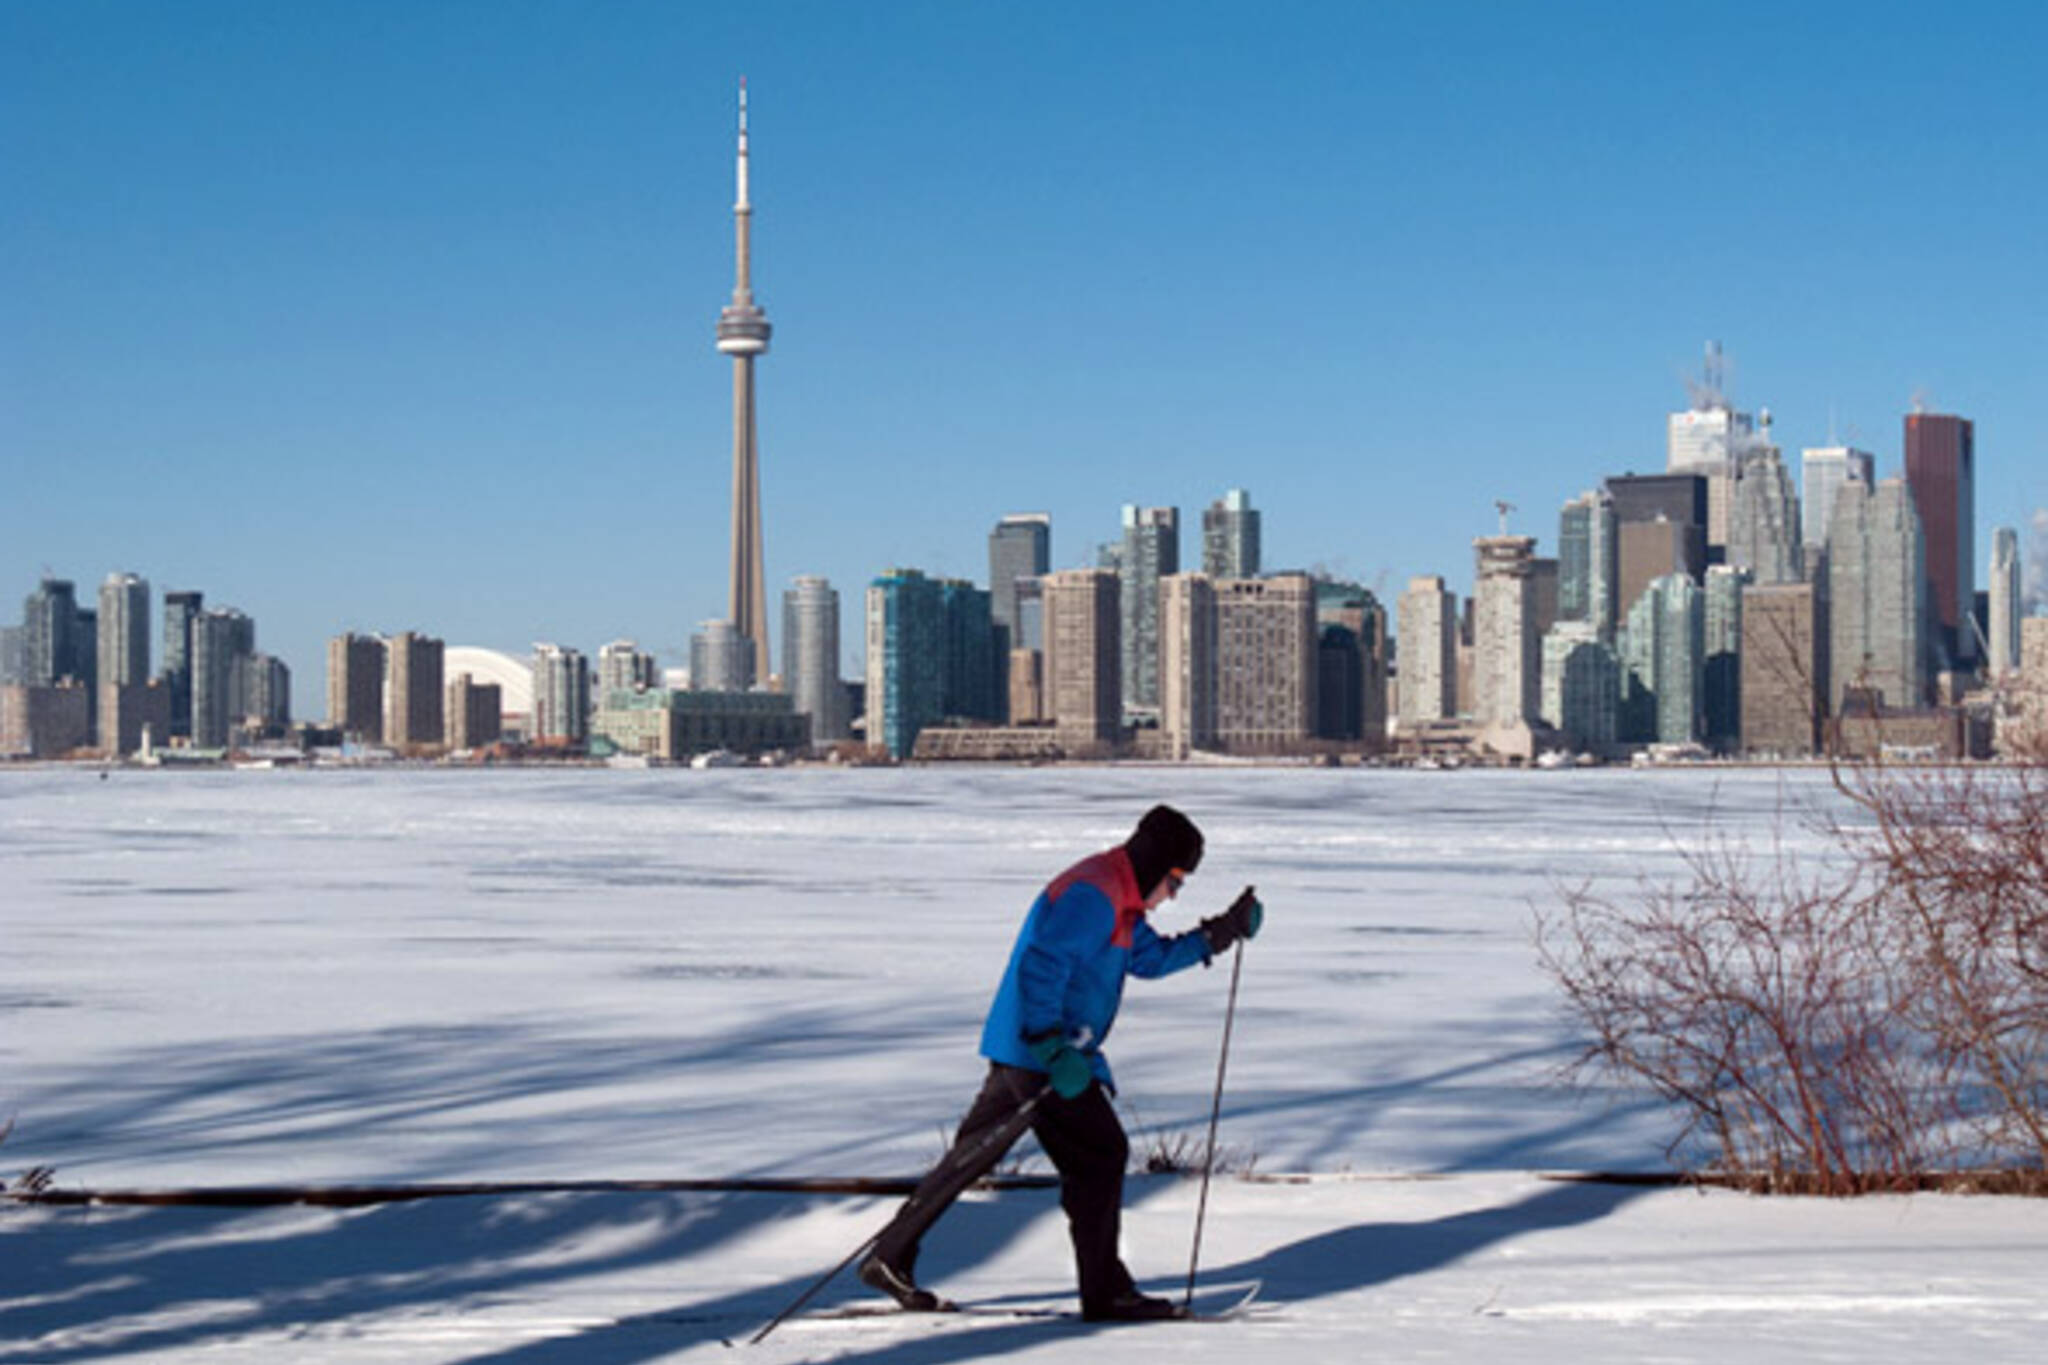 Toronto skyline winter skiing